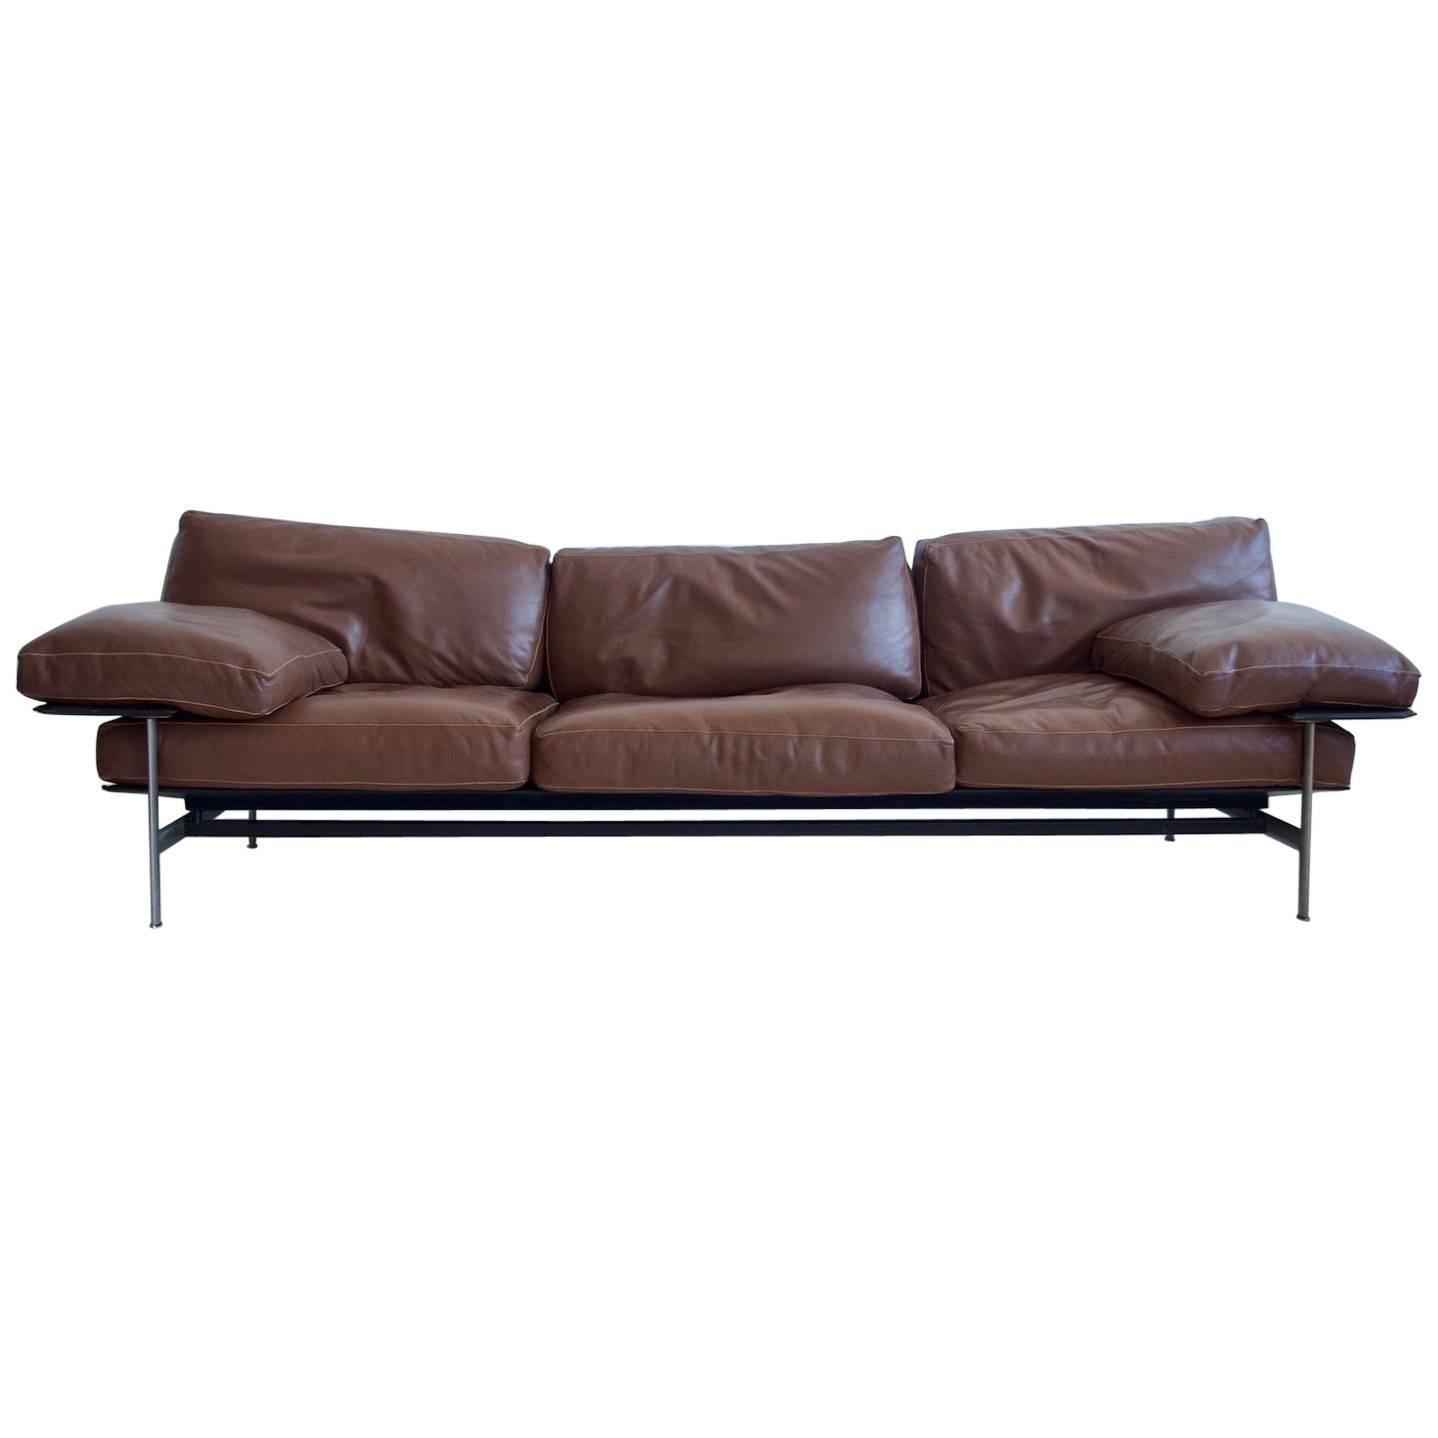 Incroyable Antonio Citterio And Paolo Nava Brown Leather Sofa, Model Diesis